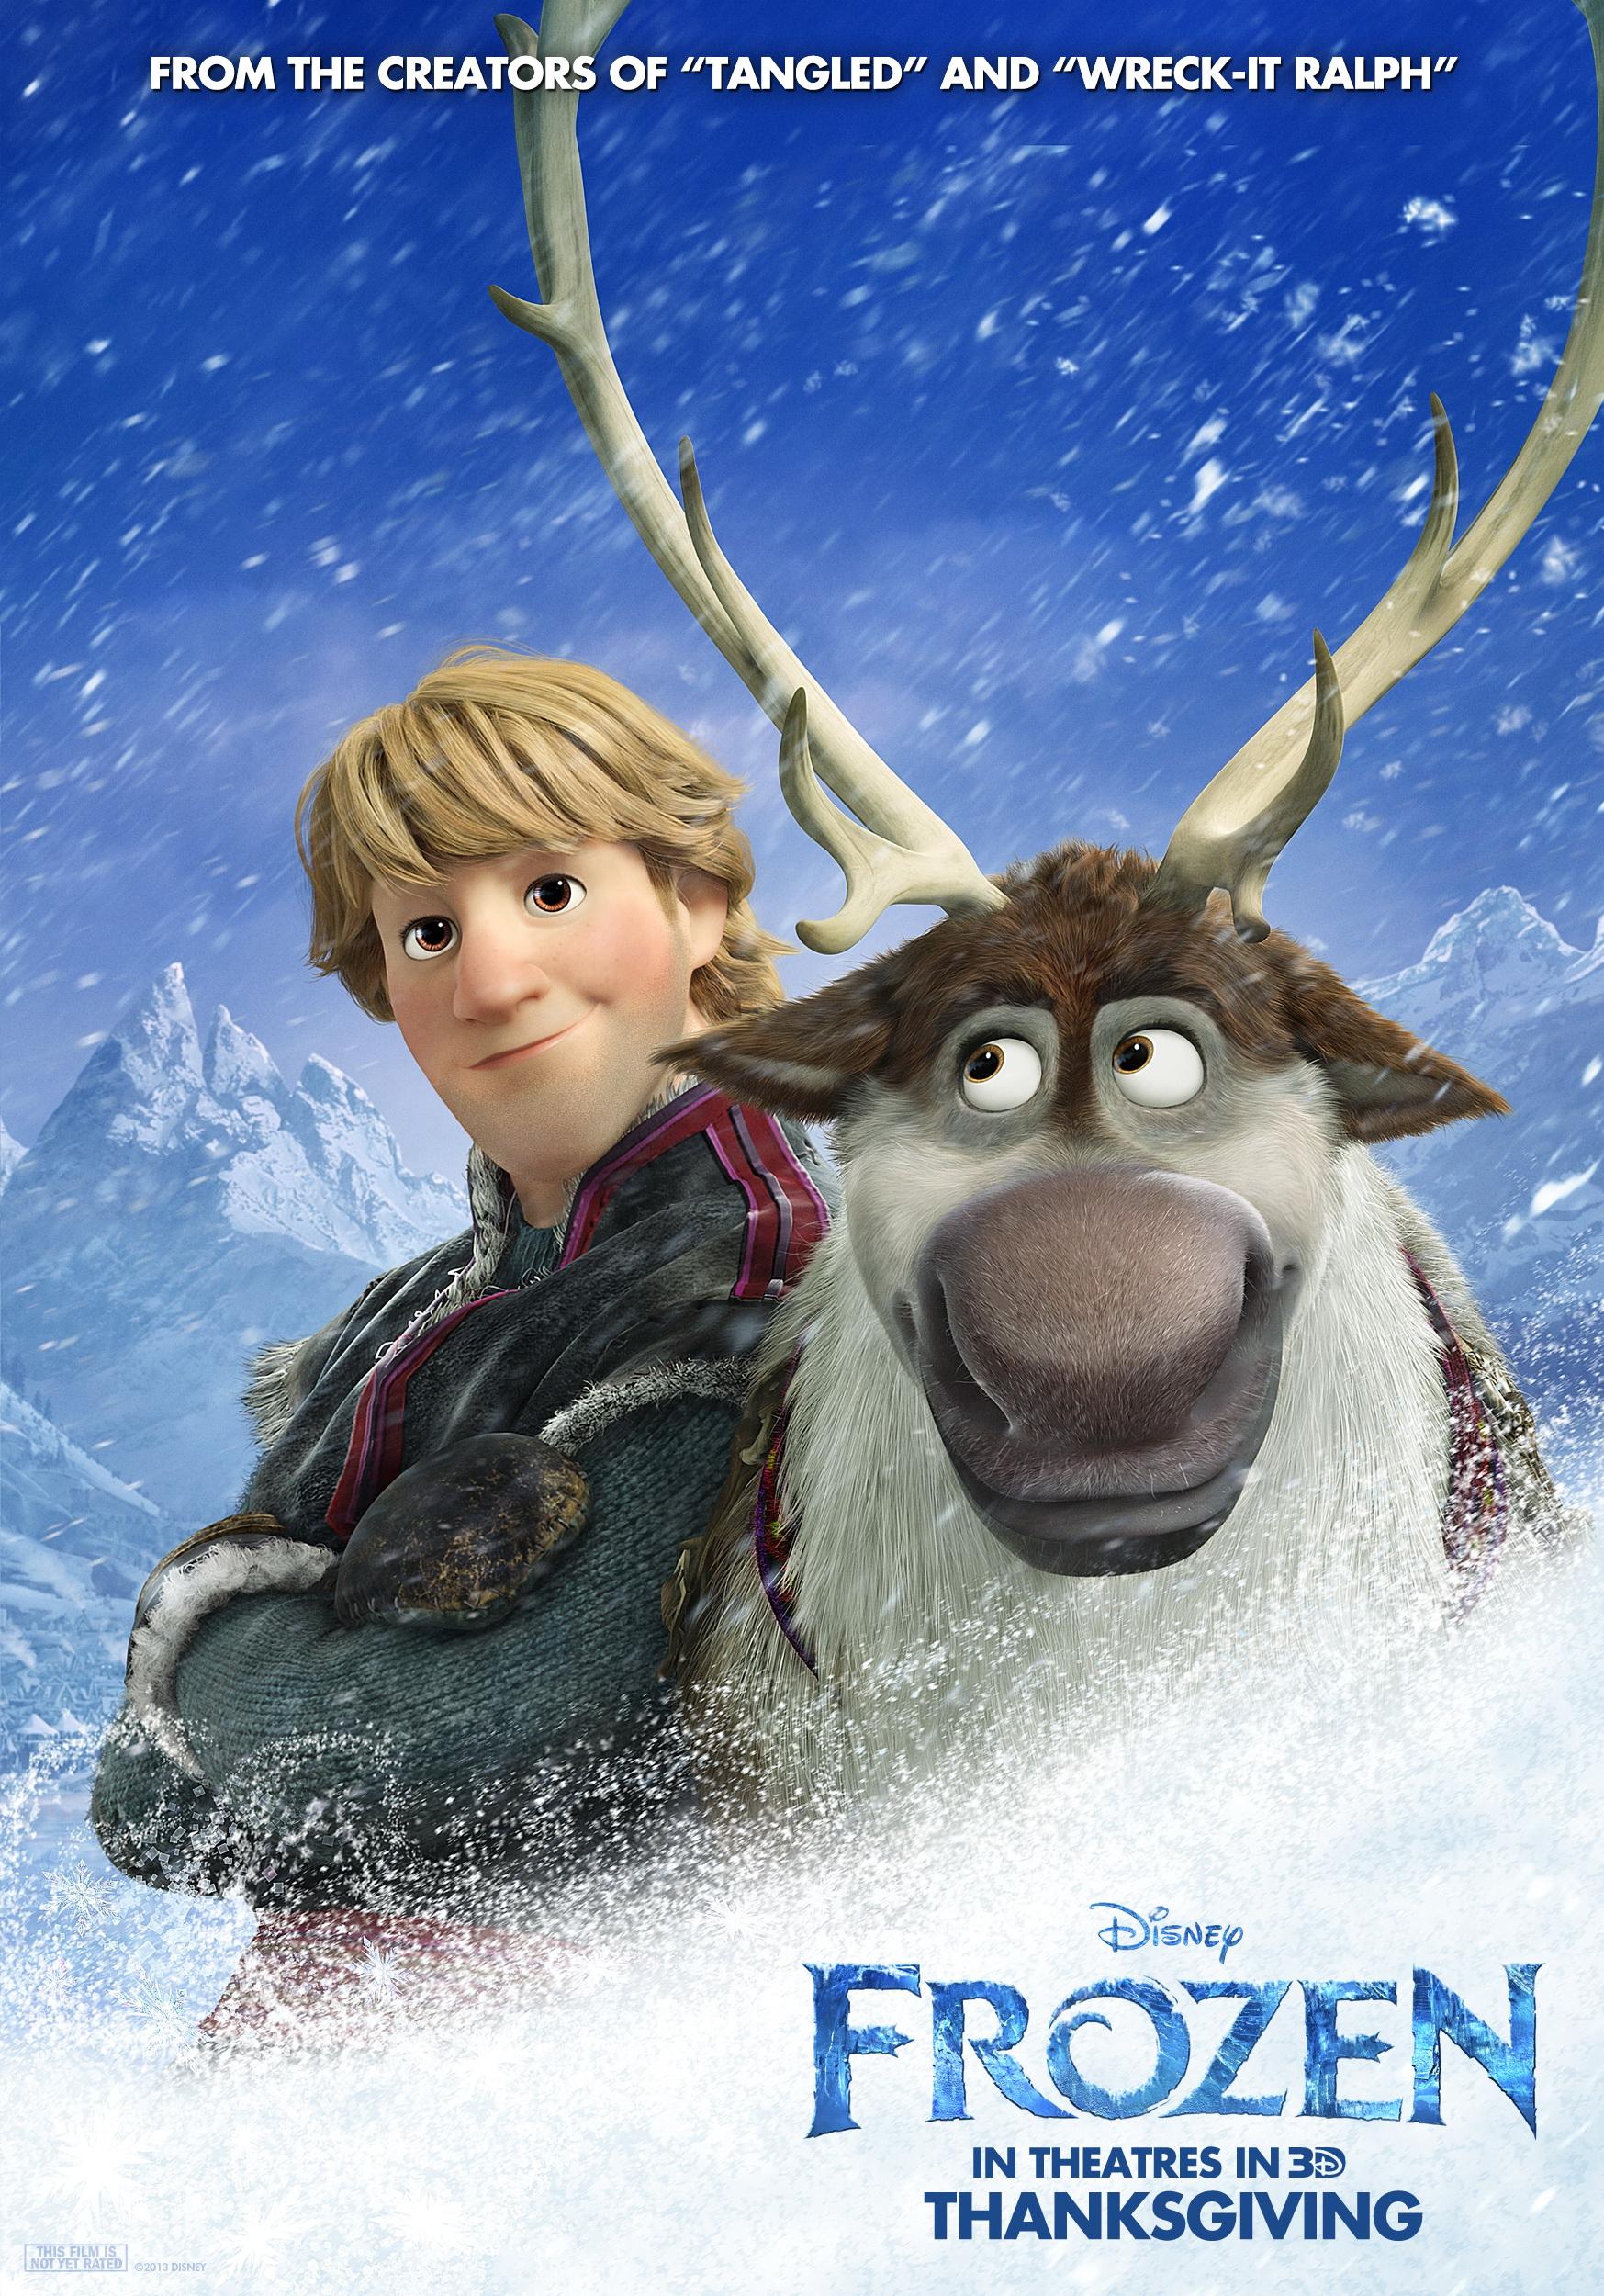 Frozen Walt Disney Movie Promo Poster Anna Elsa Sven Kristoff Entertainment Memorabilia Current Releases